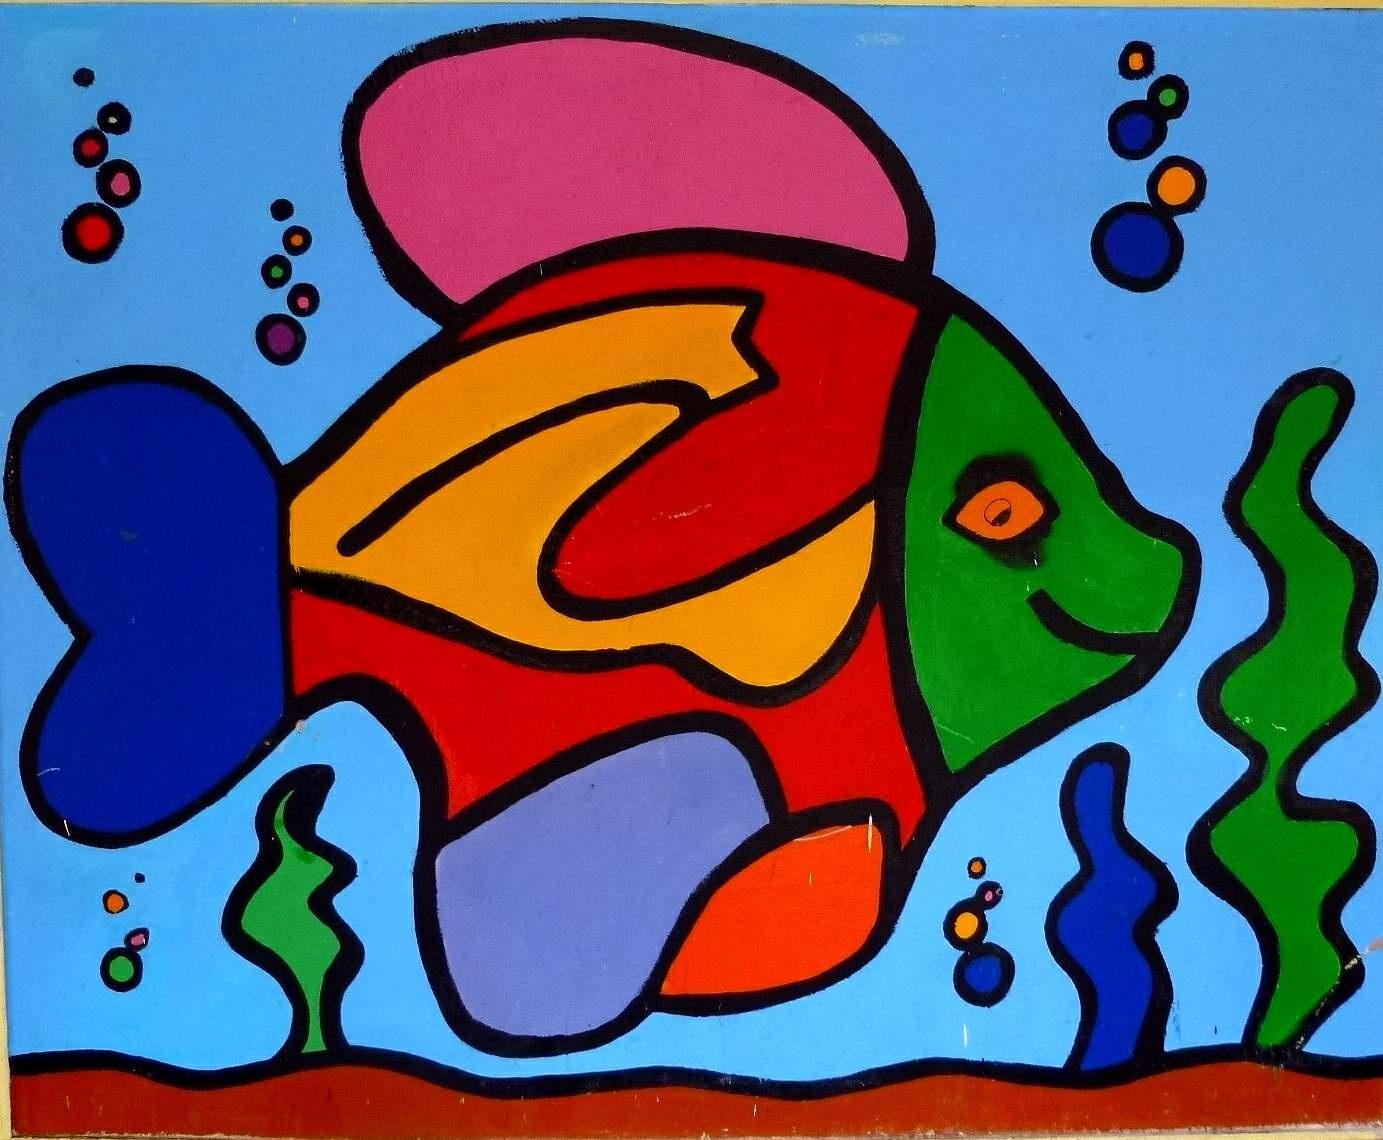 Free Images : window, glass, fish, graffiti, painting, street art ...